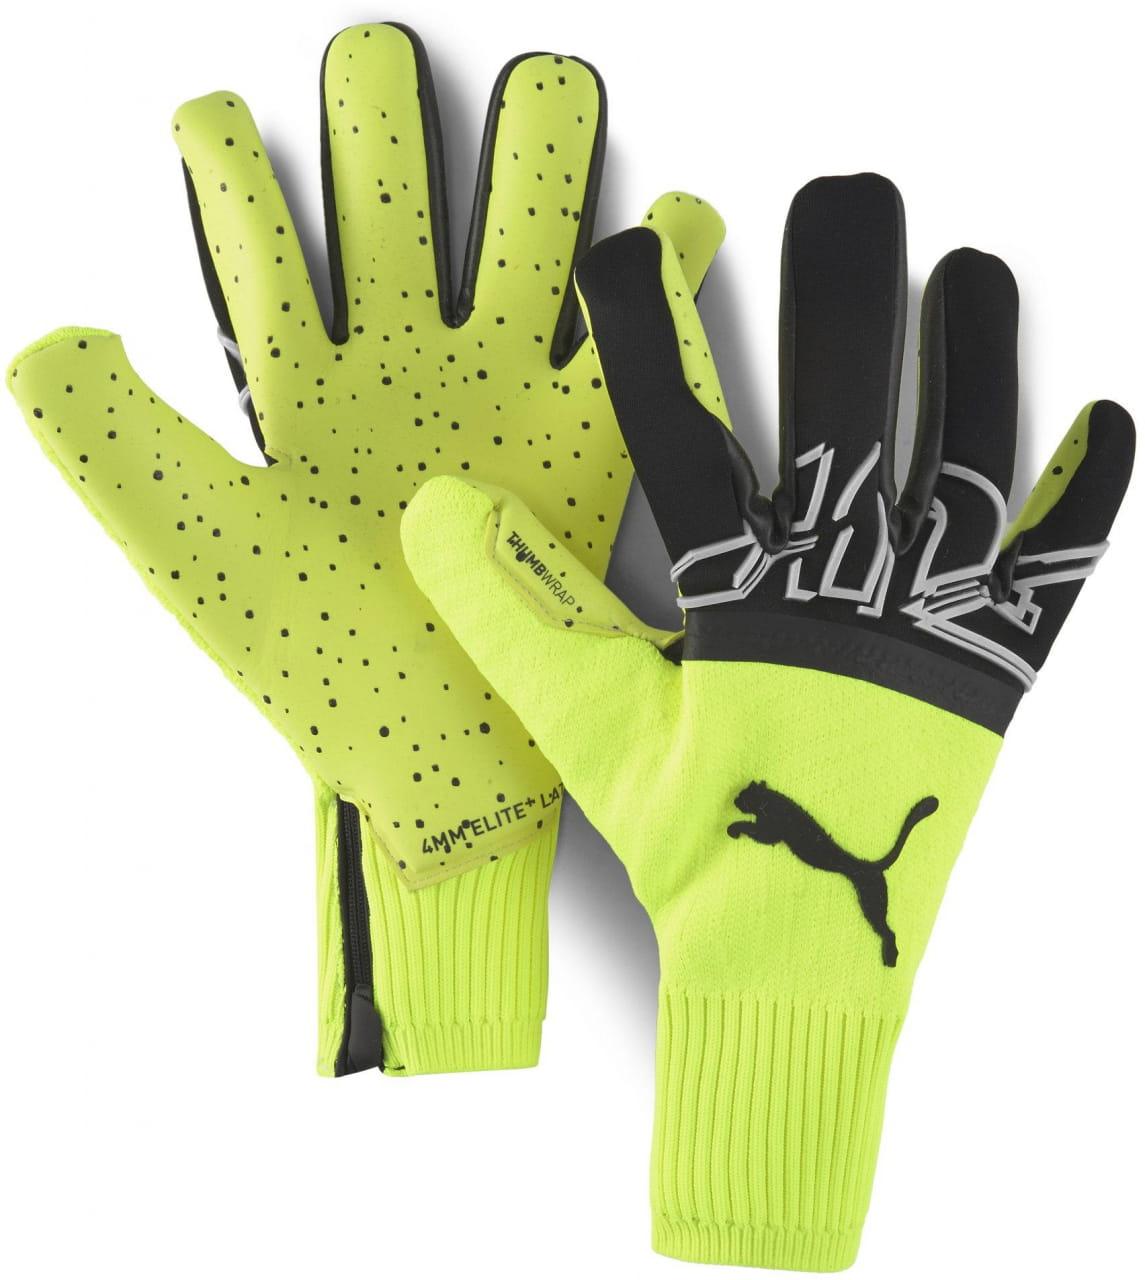 Brankářské rukavice Puma Future Z Grip 1 Hybrid